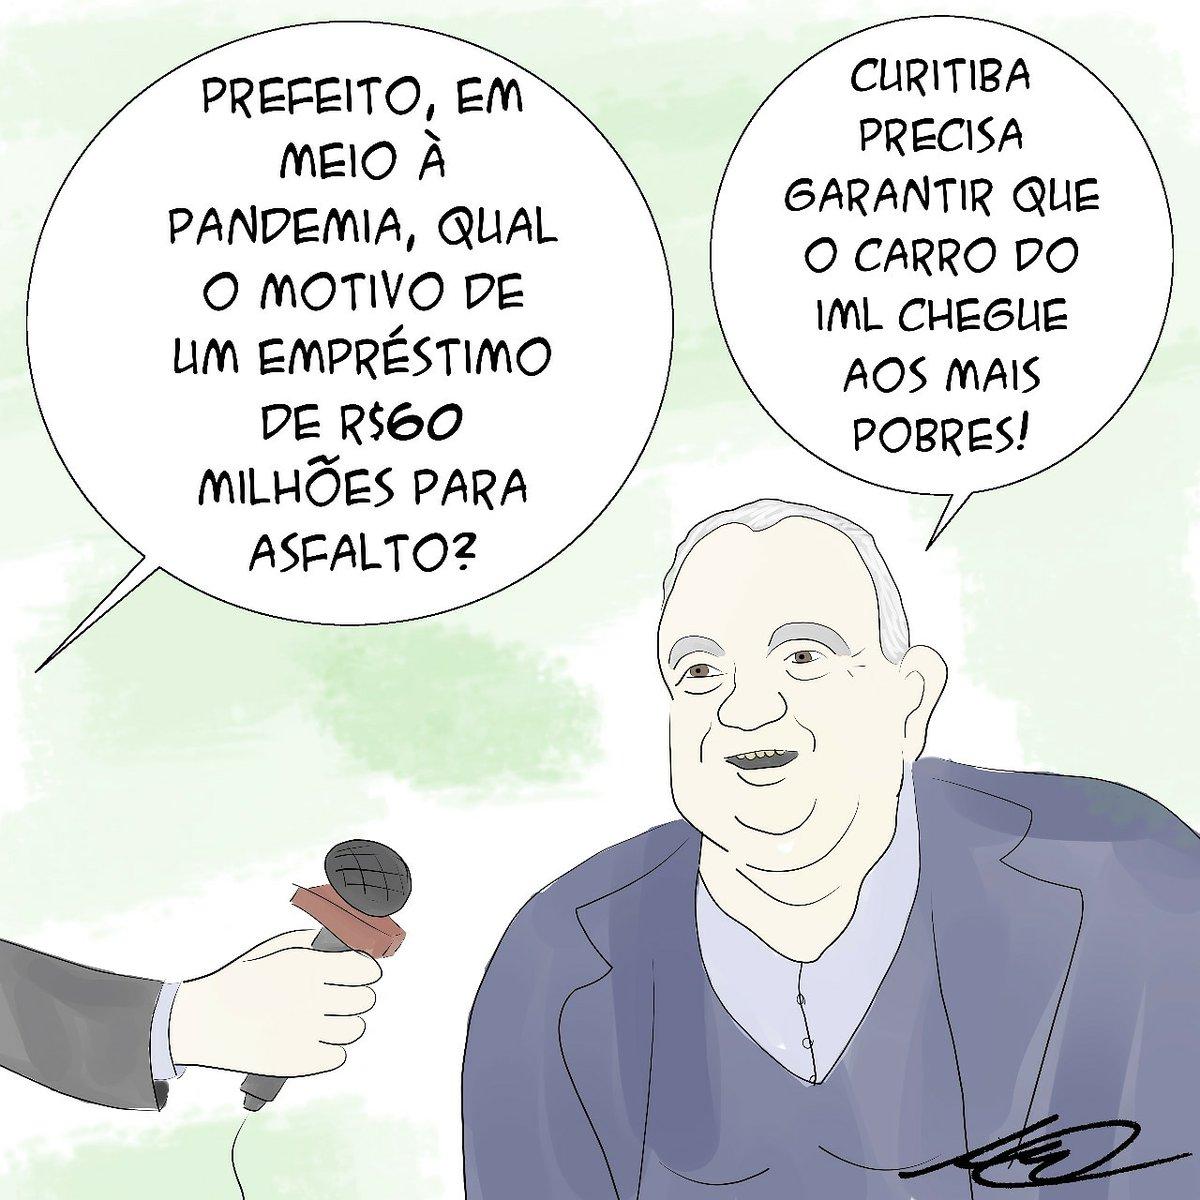 #combateaocoronavirus #coronavirus2020 #coronavirus #coronavirusbrasil #CuritibaContraVirus #curitibacontraocoronavirus #coronavirusnobrasil #curitiba #curitibapr #rafaelgreca #coronavírus #COVID #charge #chargista #arte #cartoon #ficaemcasasepuder #fiqueemcasasepuder  #covid19pic.twitter.com/gBuQzFlvEH